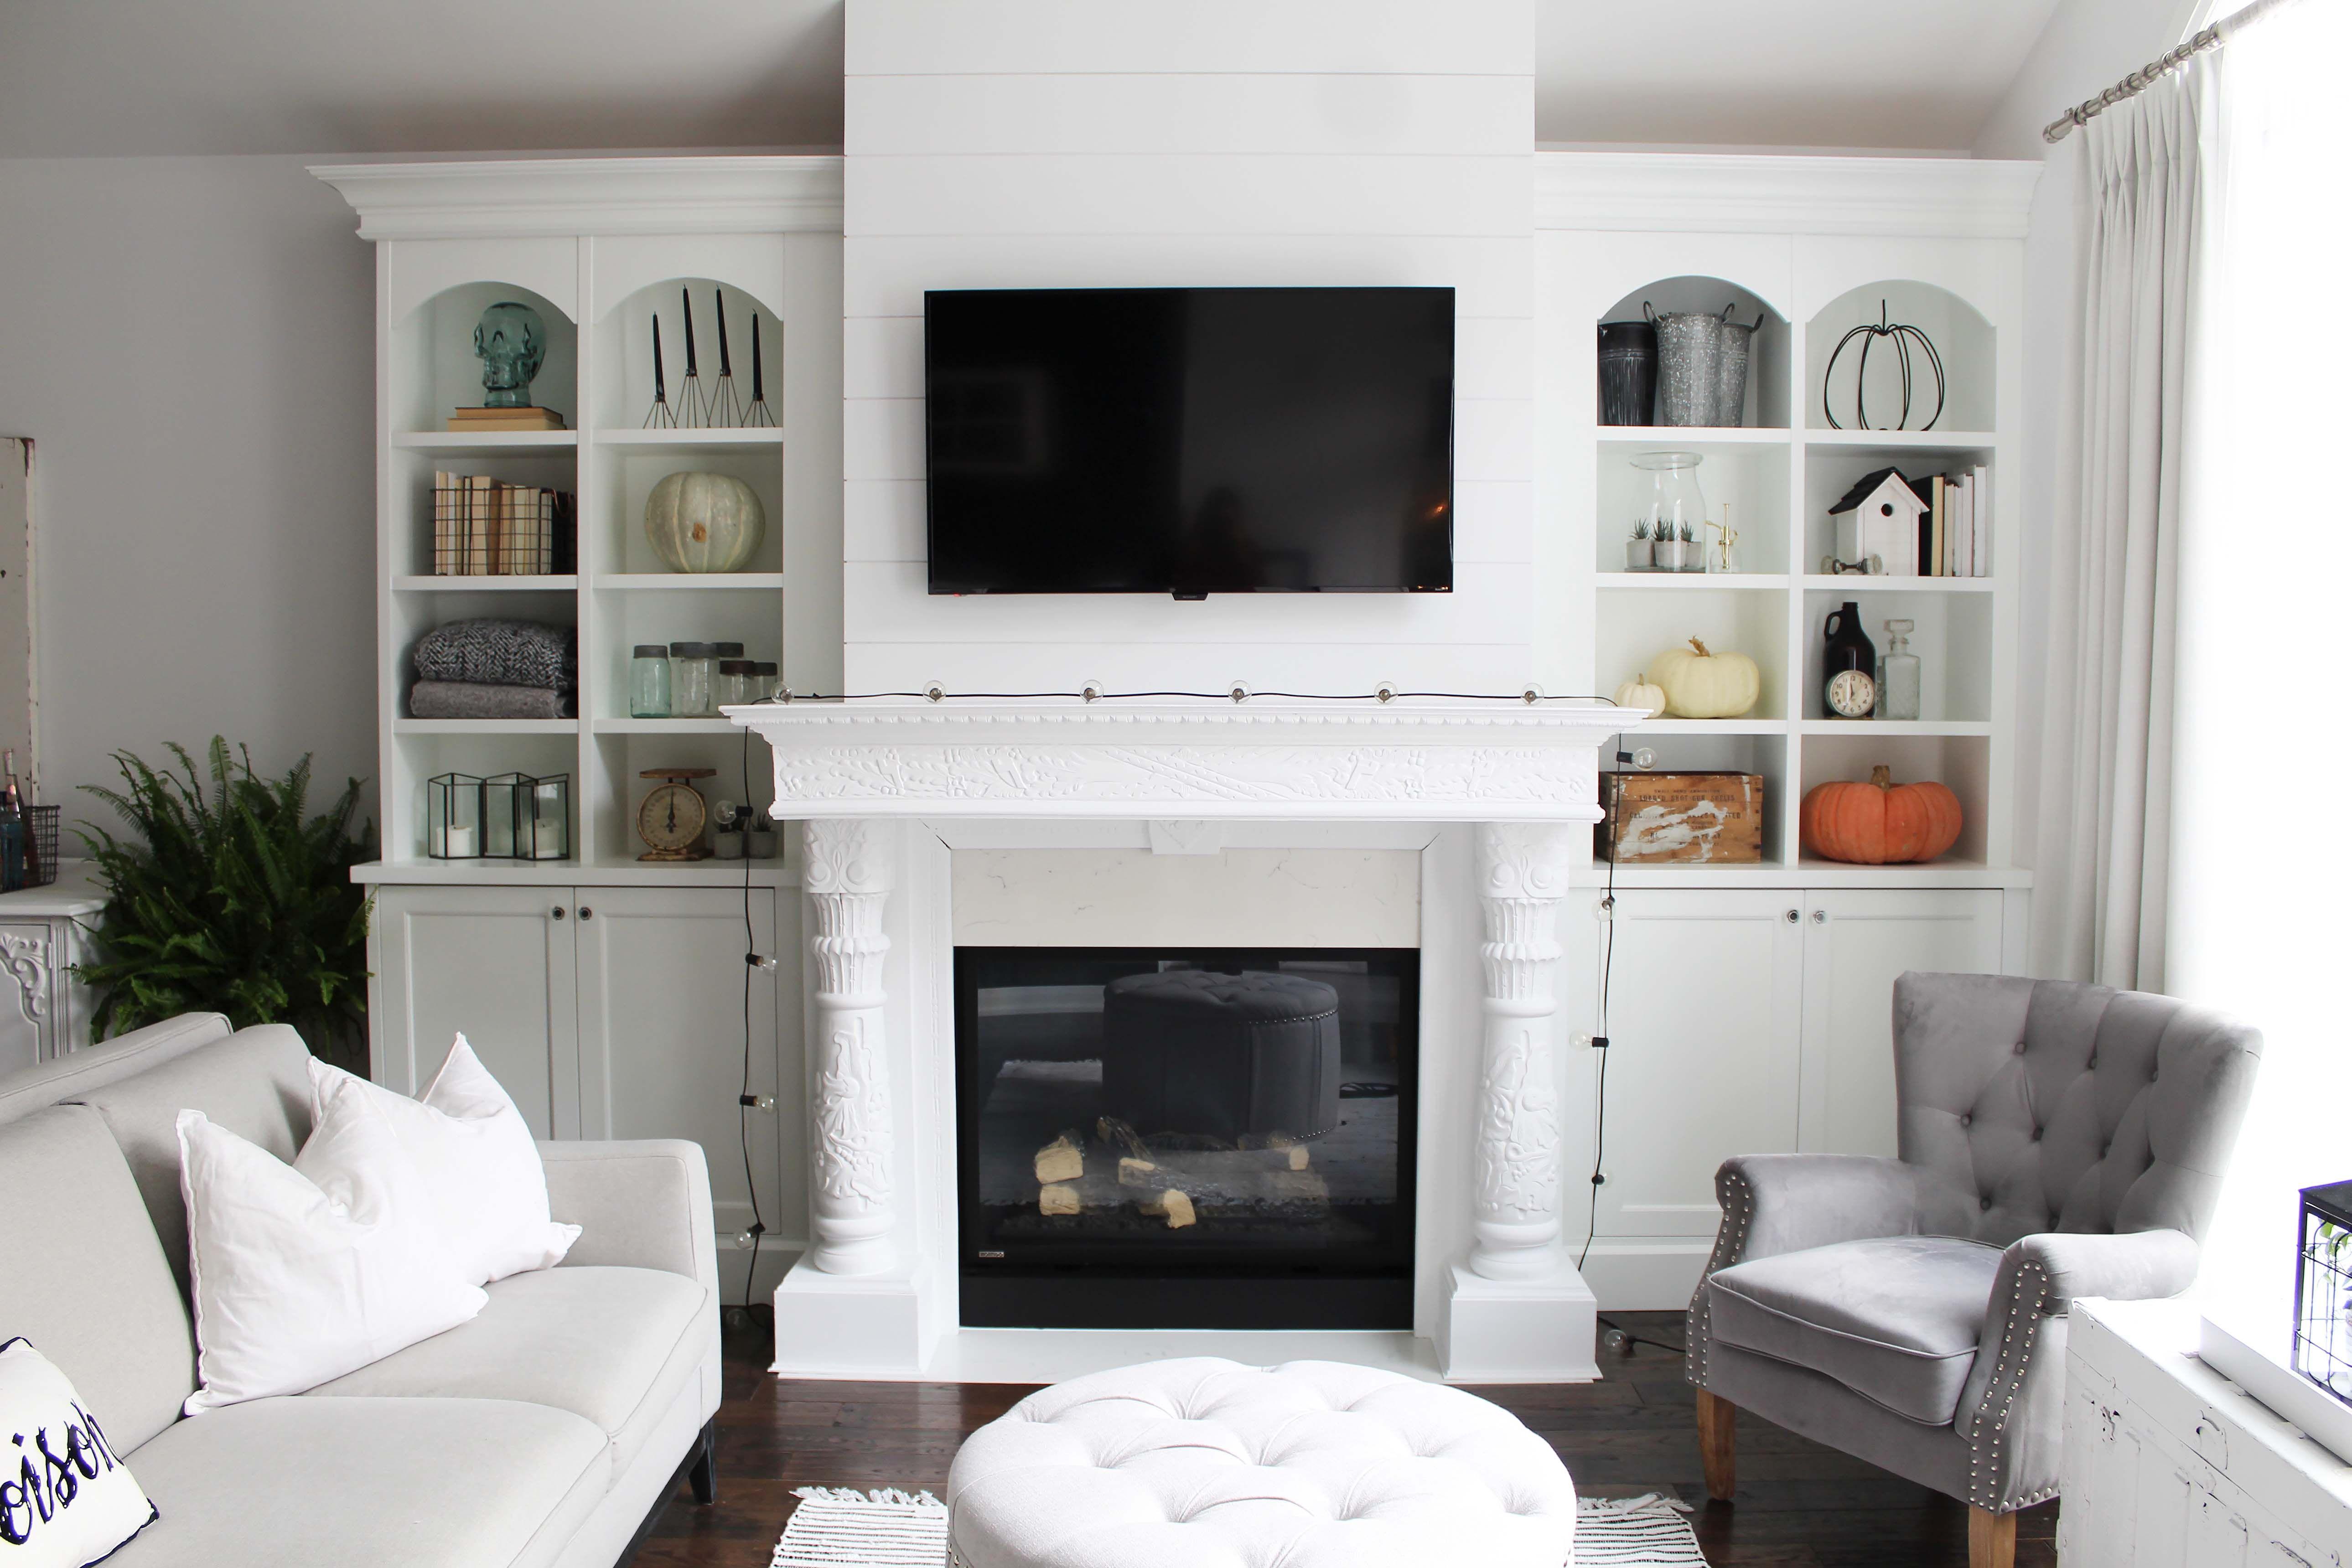 Builtins around fireplace built in around fireplace